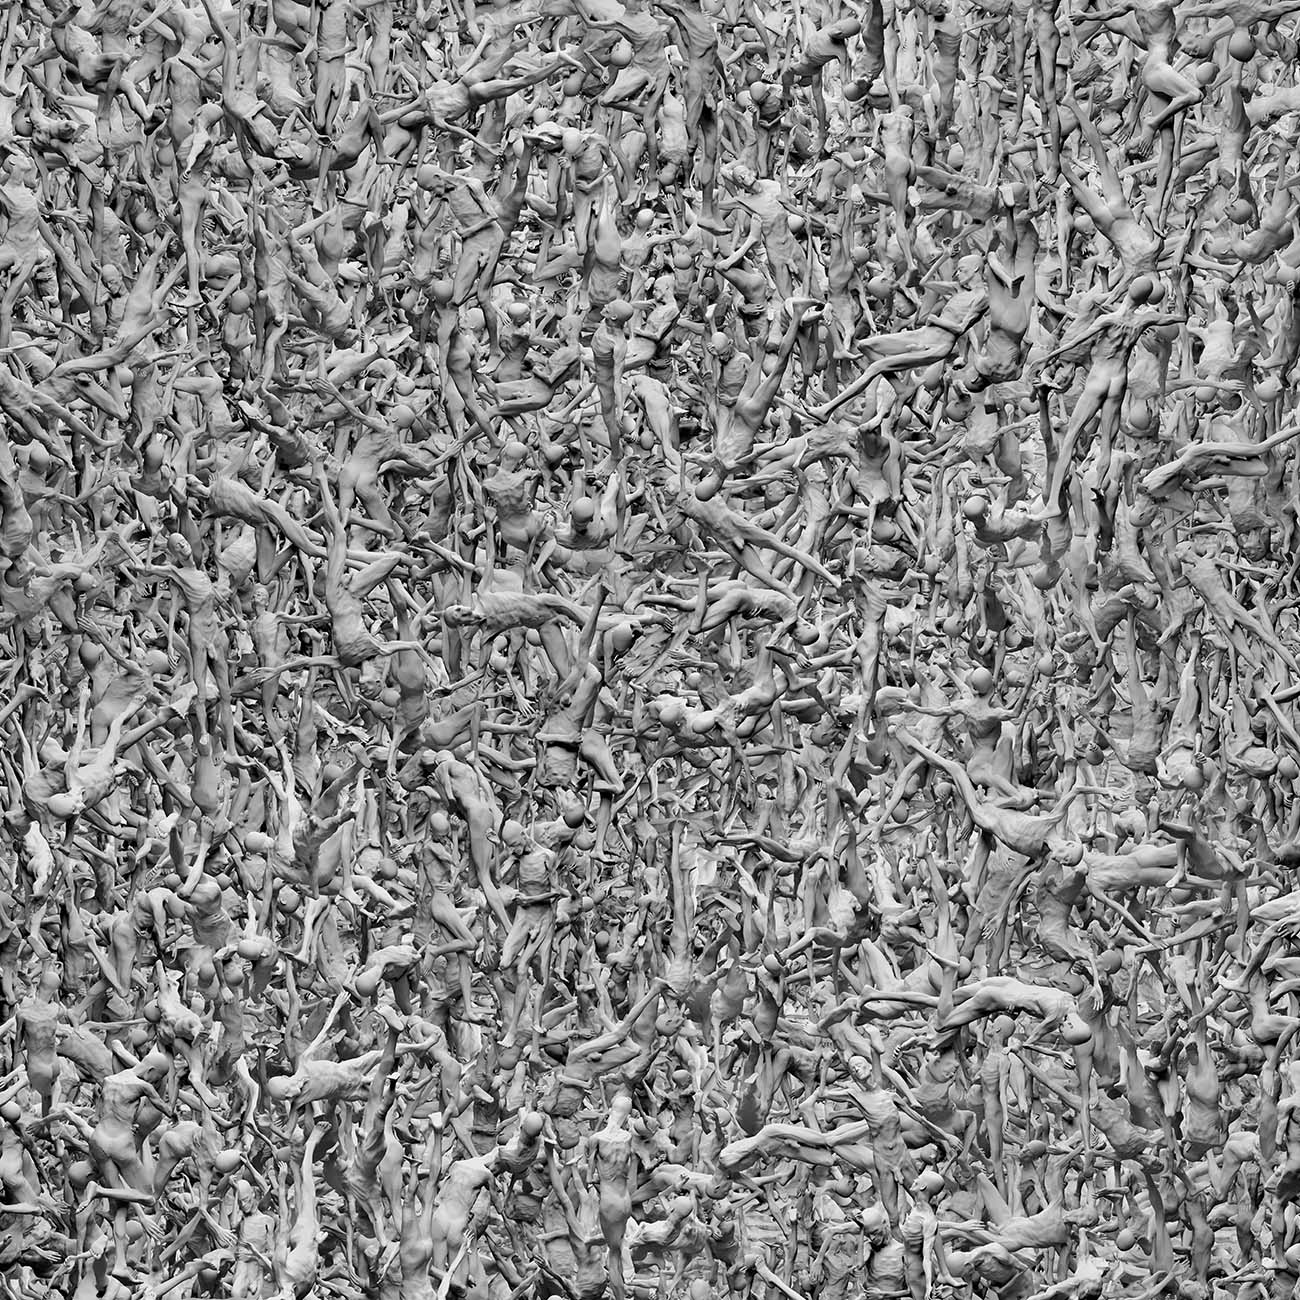 Néonicotinoïde, Paul-Louis Leger, Marseille, photographie, CGI, Clothianidine, Sulfoxaflor, Acétamipride, listatofan, Reykjavik